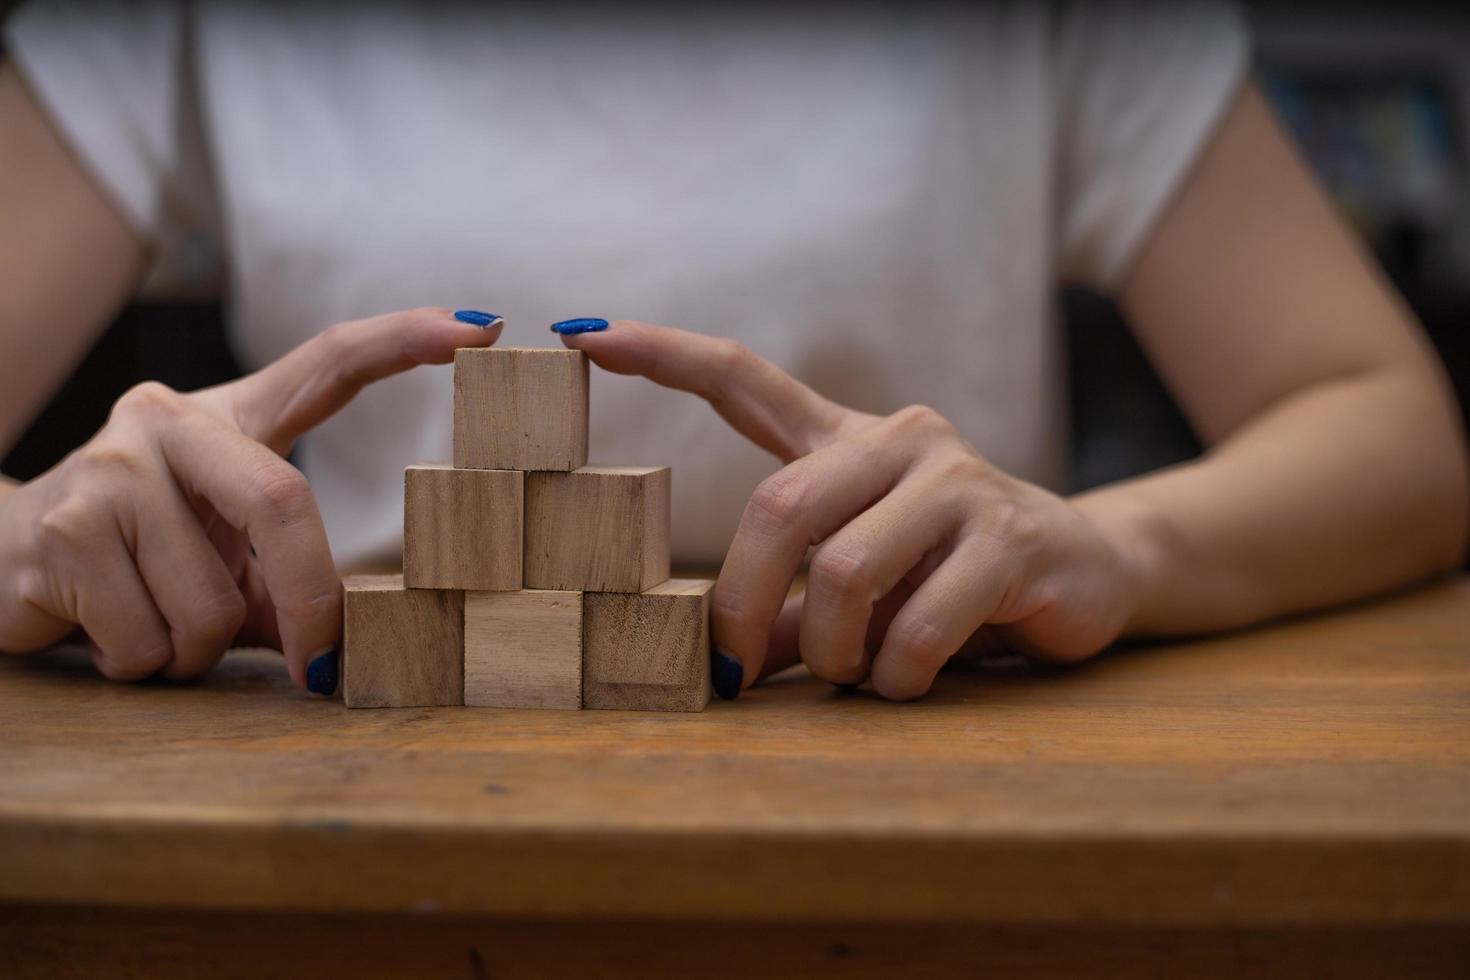 Woman stacking wooden blocks photo